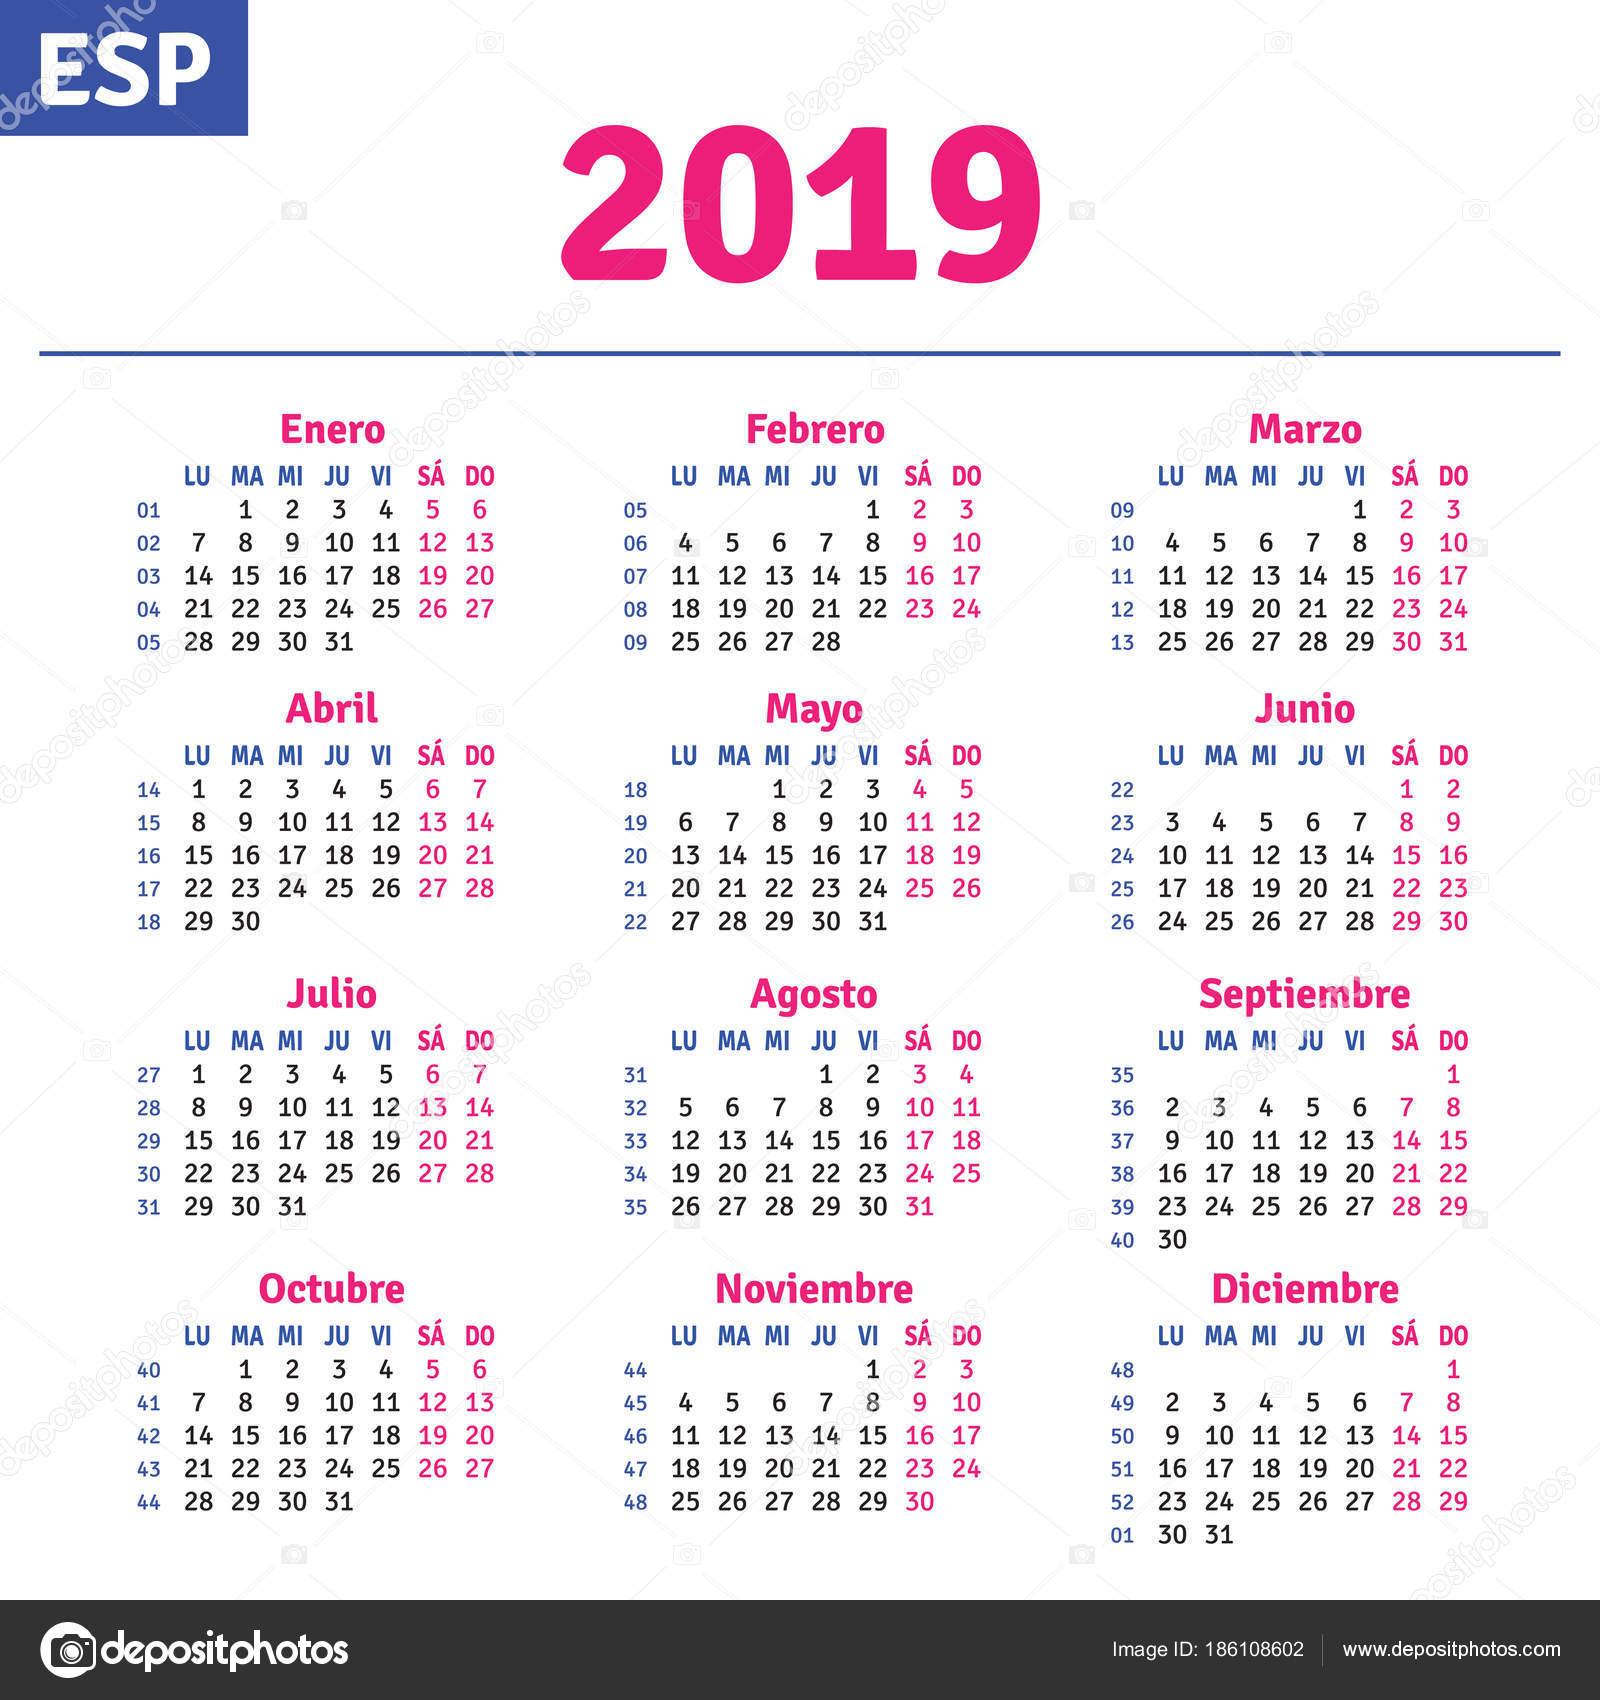 Calendario Spagnolo.Calendario Spagnolo 2019 Vettoriali Stock C Rustamank